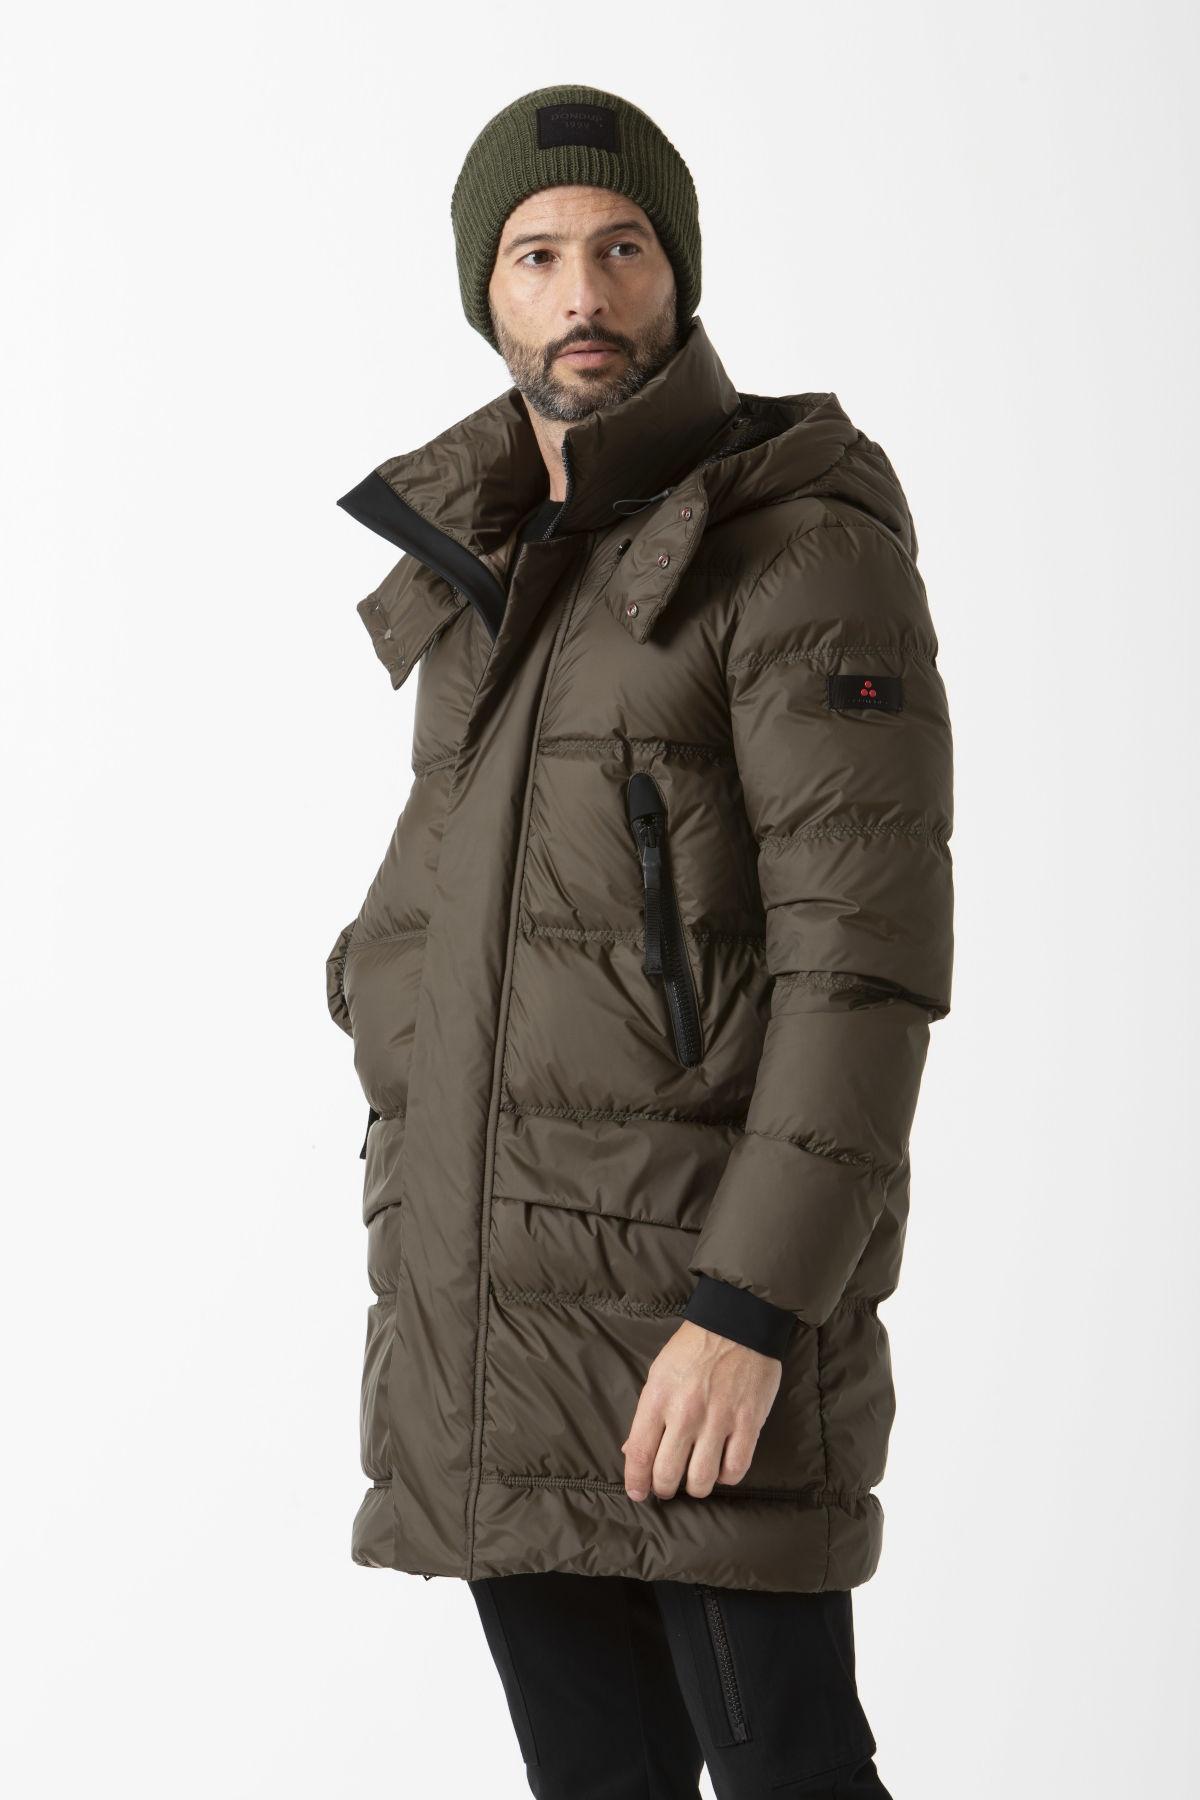 Jacket TVEIT for man PEUTEREY F/W 19-20